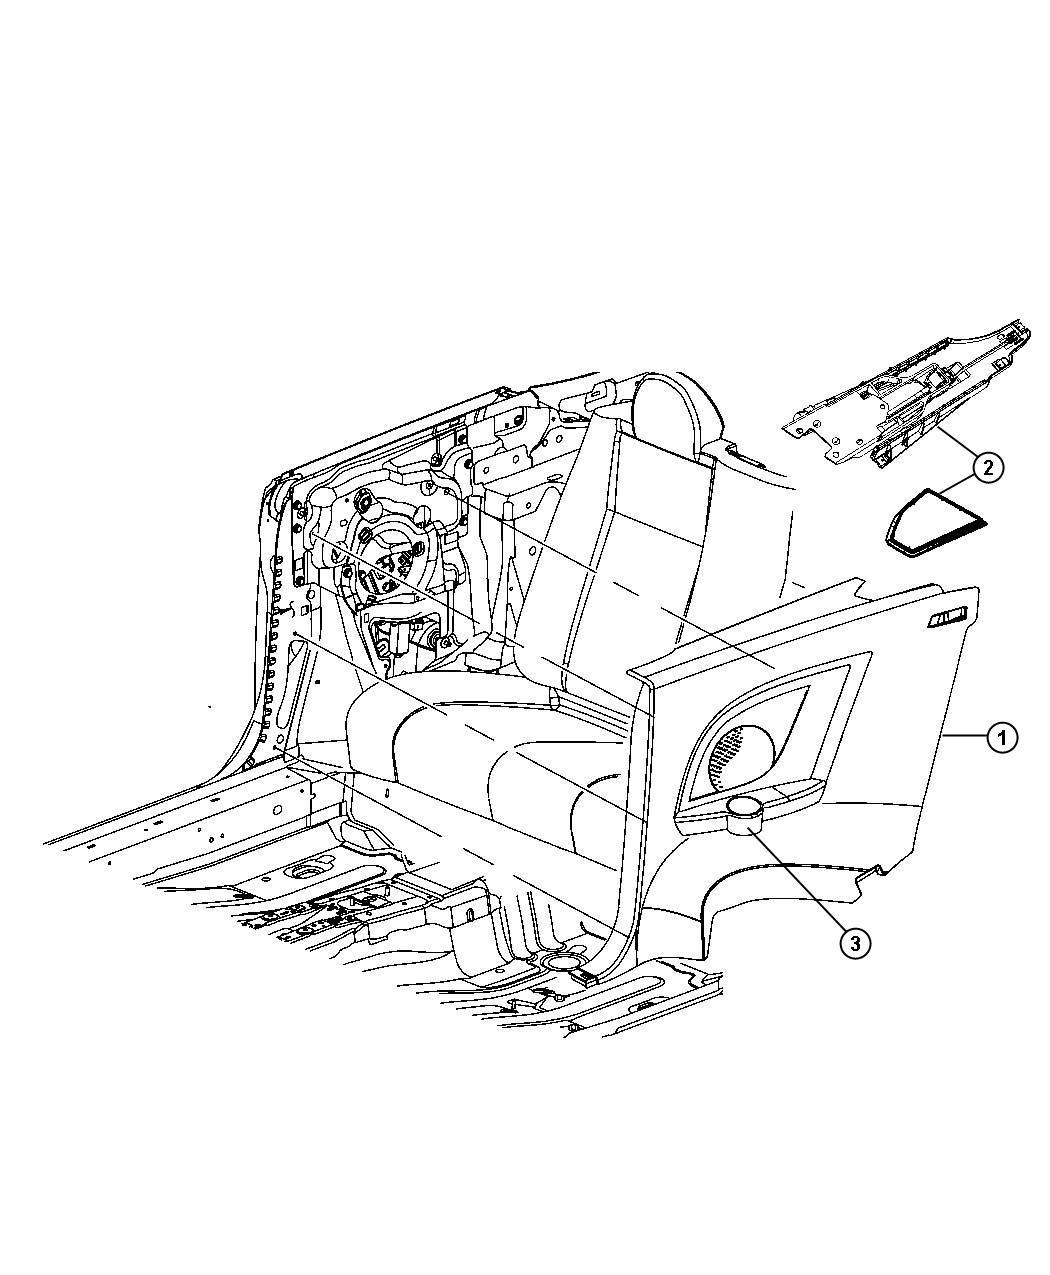 Chrysler Sebring Door Qtr Trim Access Otr Right J1